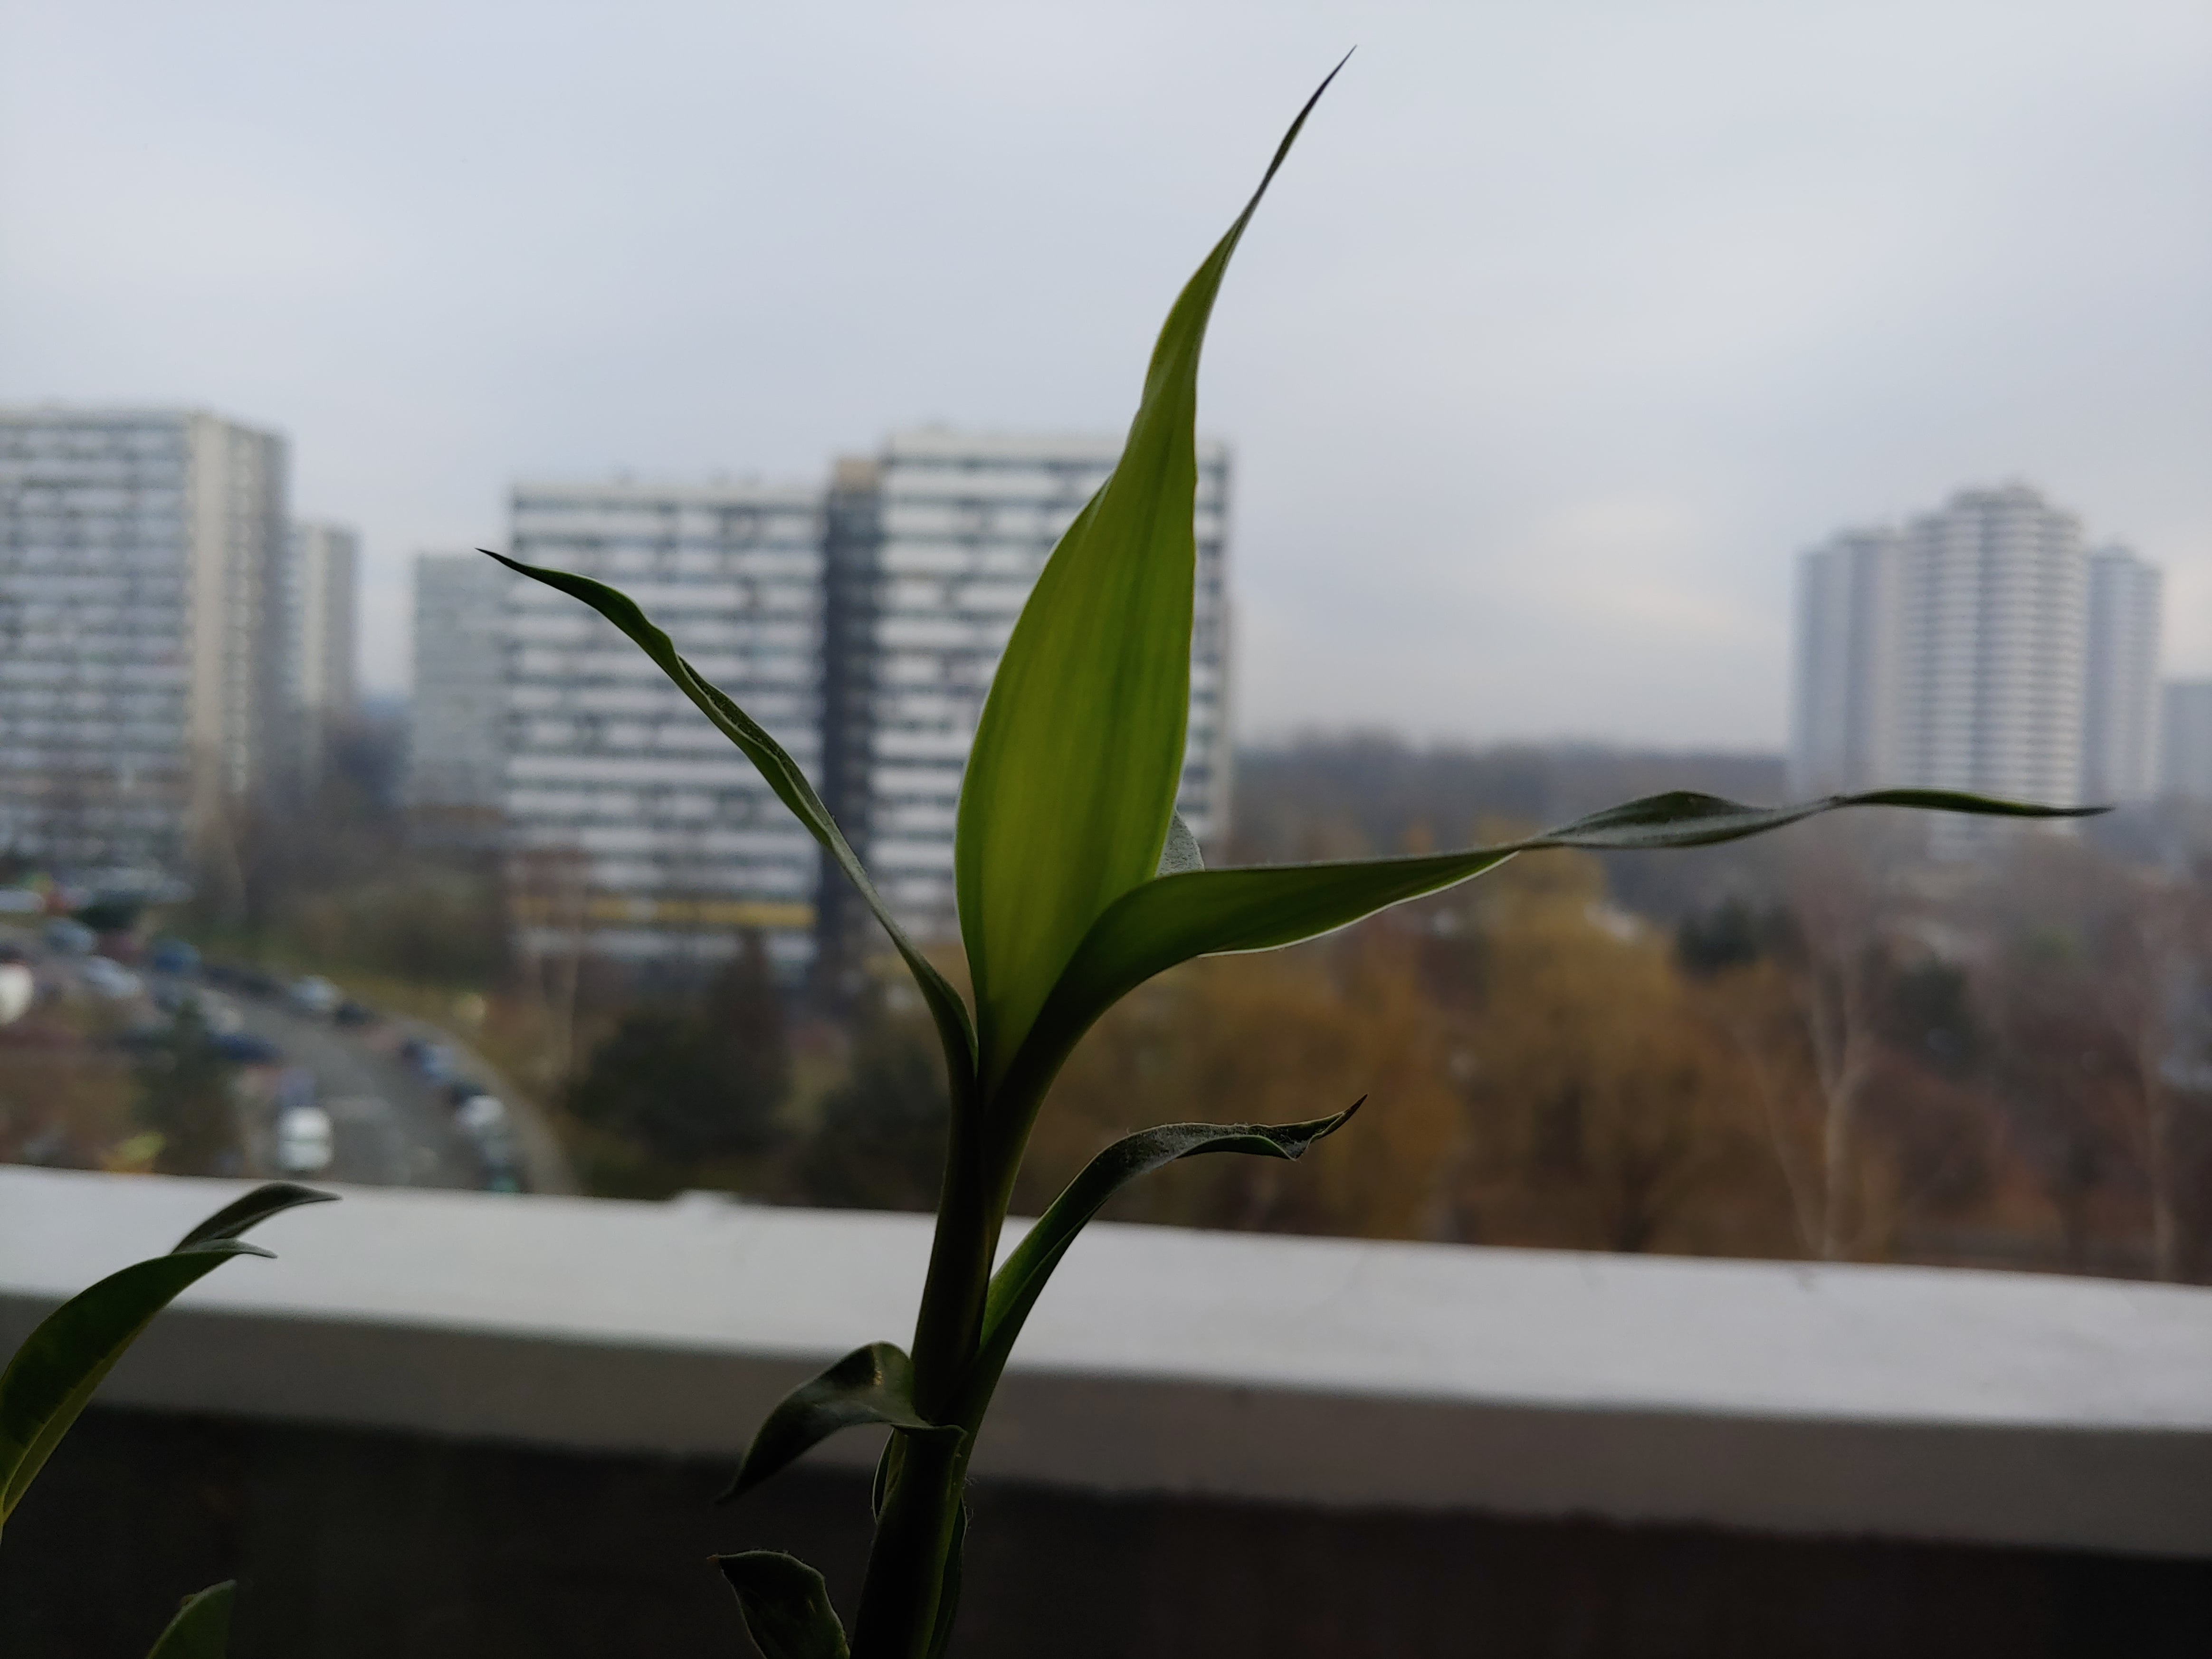 Zdjęcia makro - LG G7 ThinQ